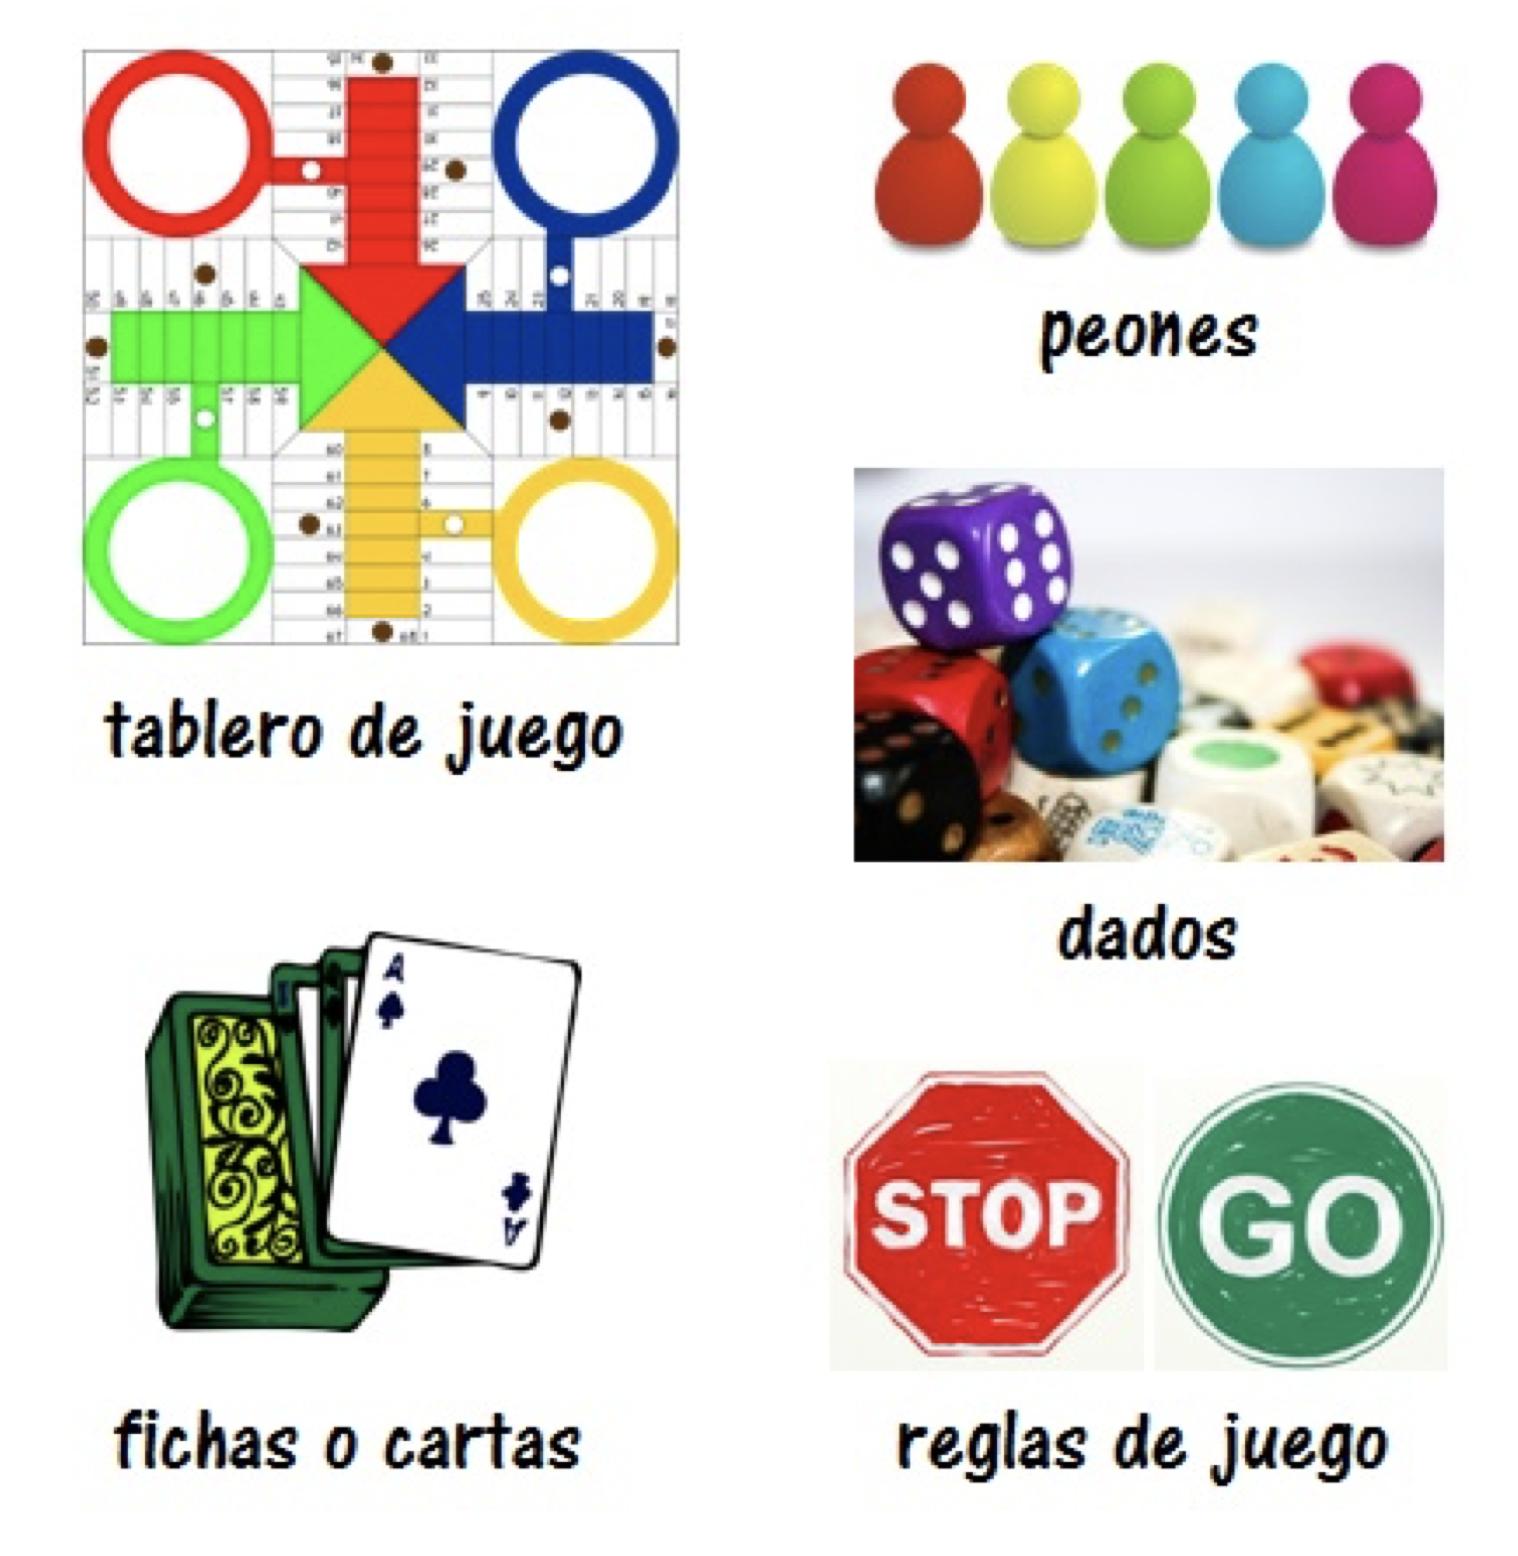 Juegos de mesa para clase de español. Diseñar tus propios materiales para clase. #spanishteacher #profedeele